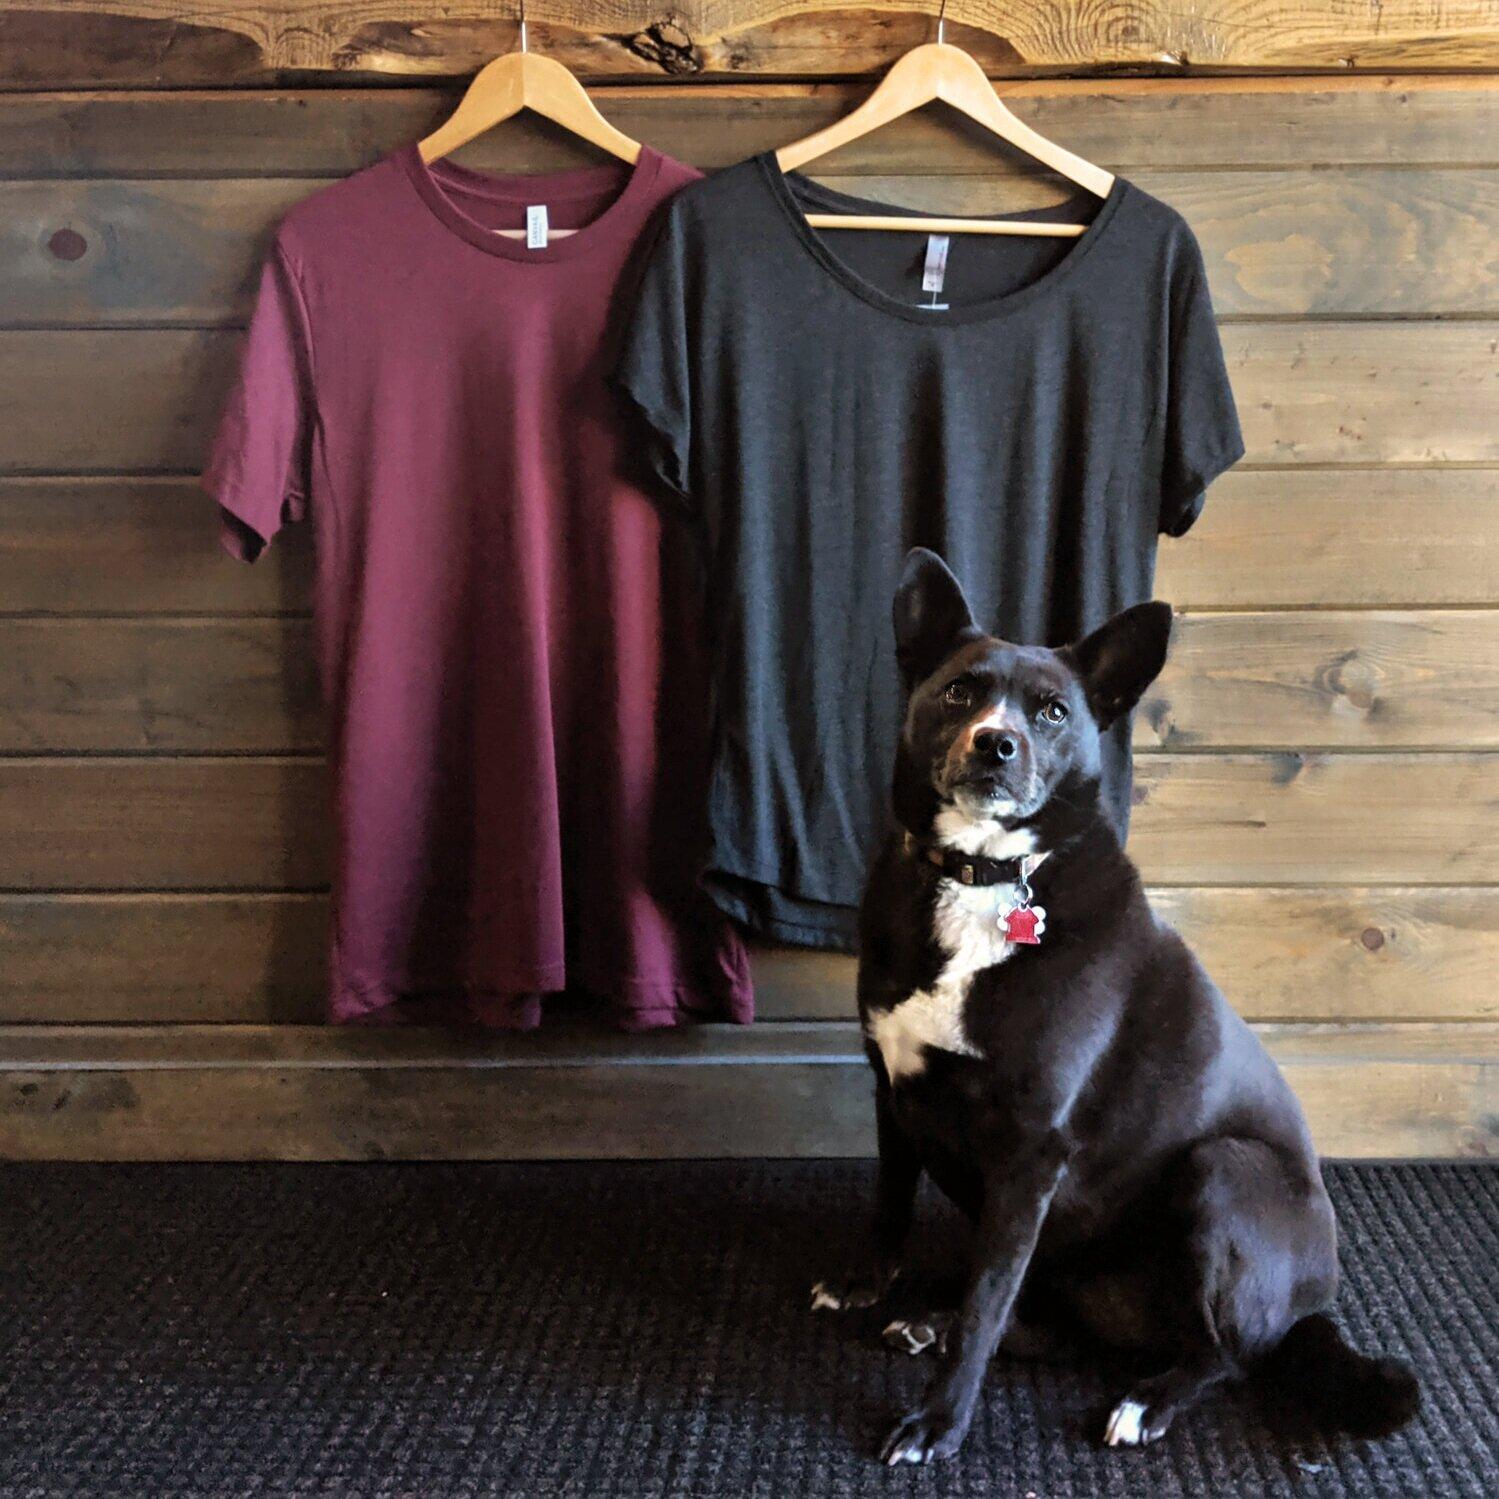 Olly Dog: Owner Operator